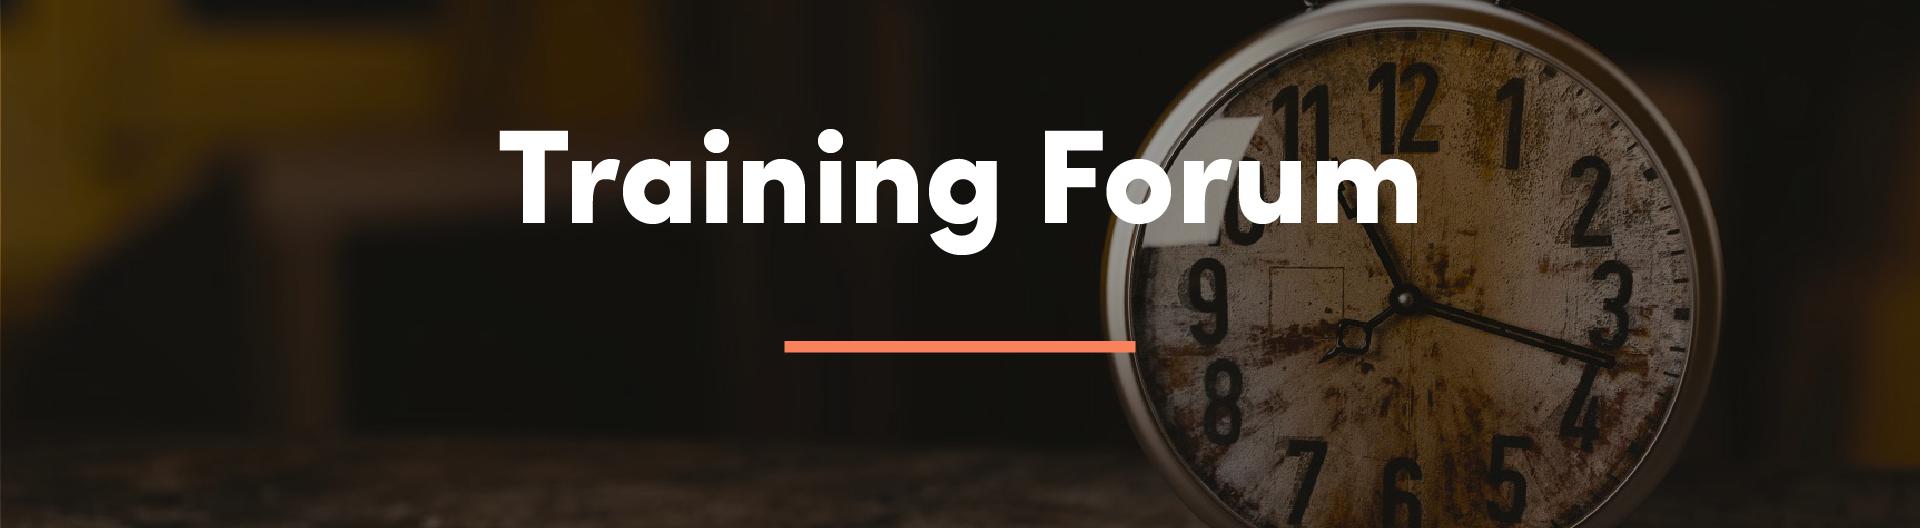 TrainingForums-Campaign_Banner.png